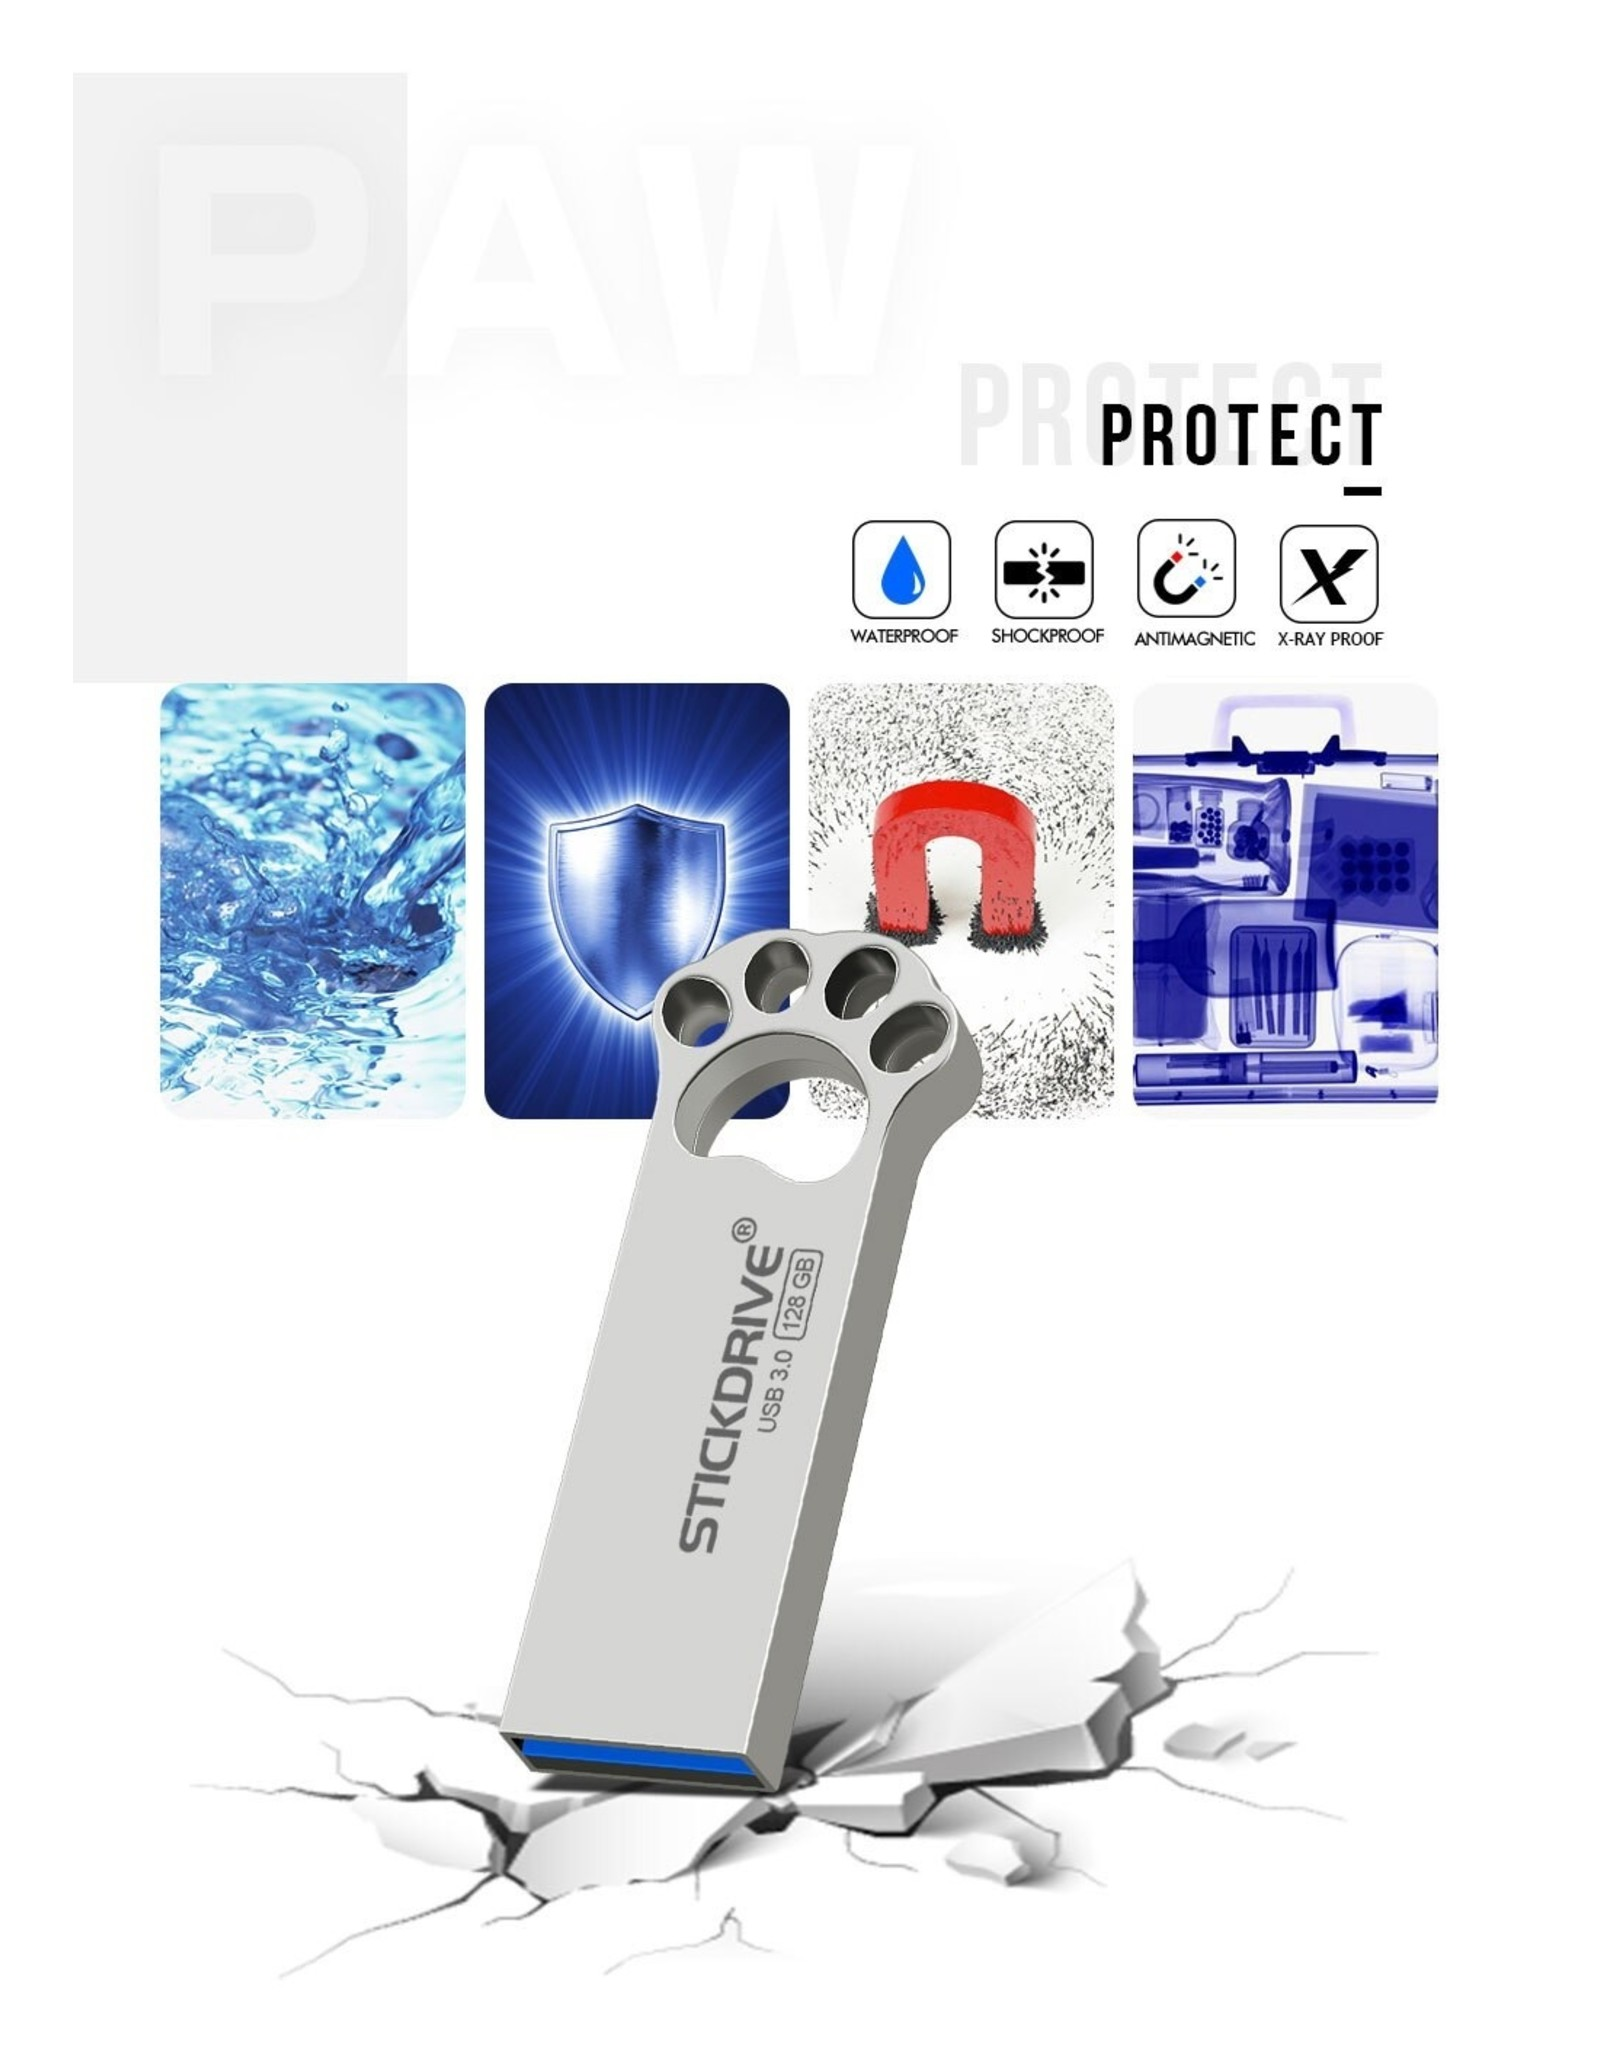 Usb flash drive 64 gb metalen USB 3.0 zilveren pendrive - grijs